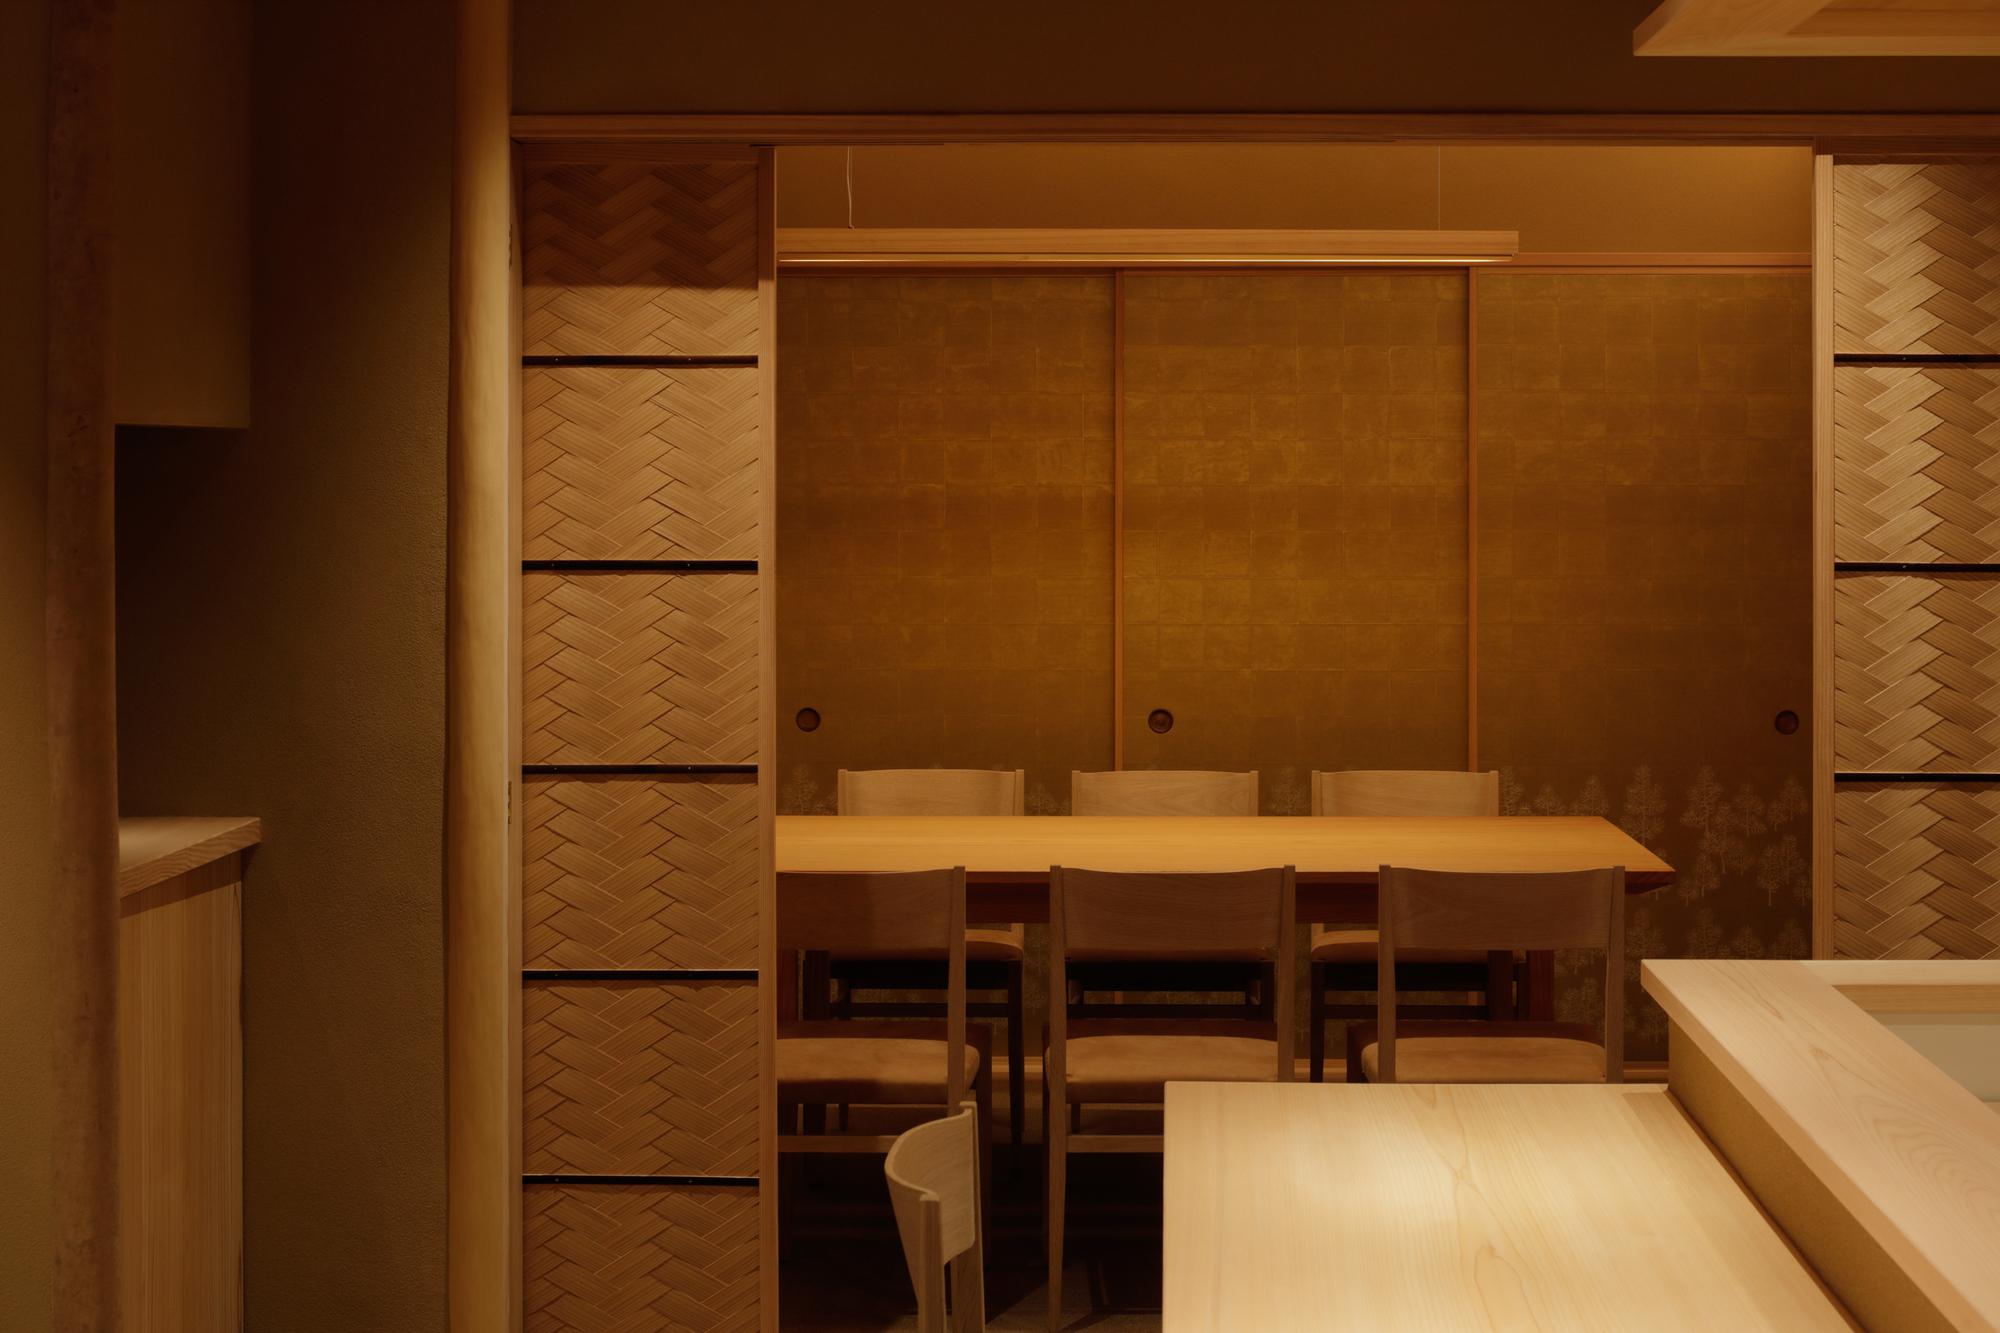 gallery of japanese cuisine tokiwa